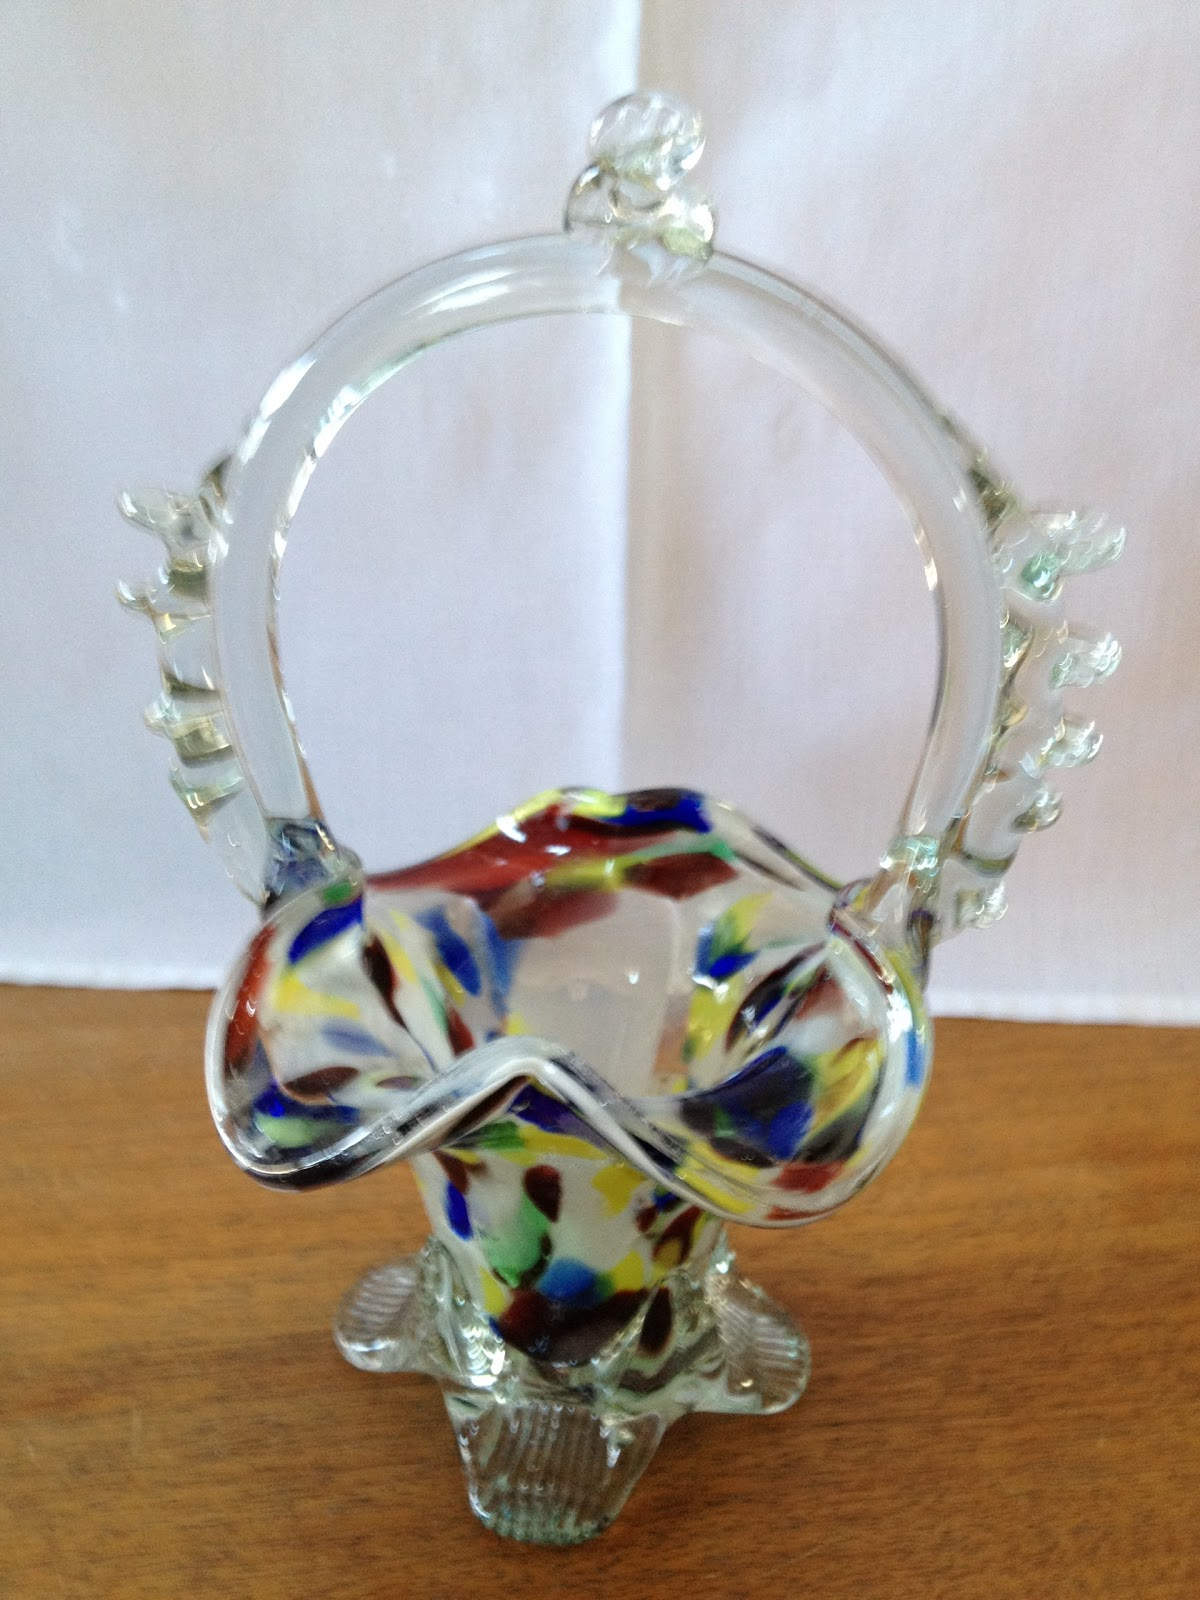 Simply Creative: Hand-Blown Glass Sculpture by Scott Bisson  |Blown Glass